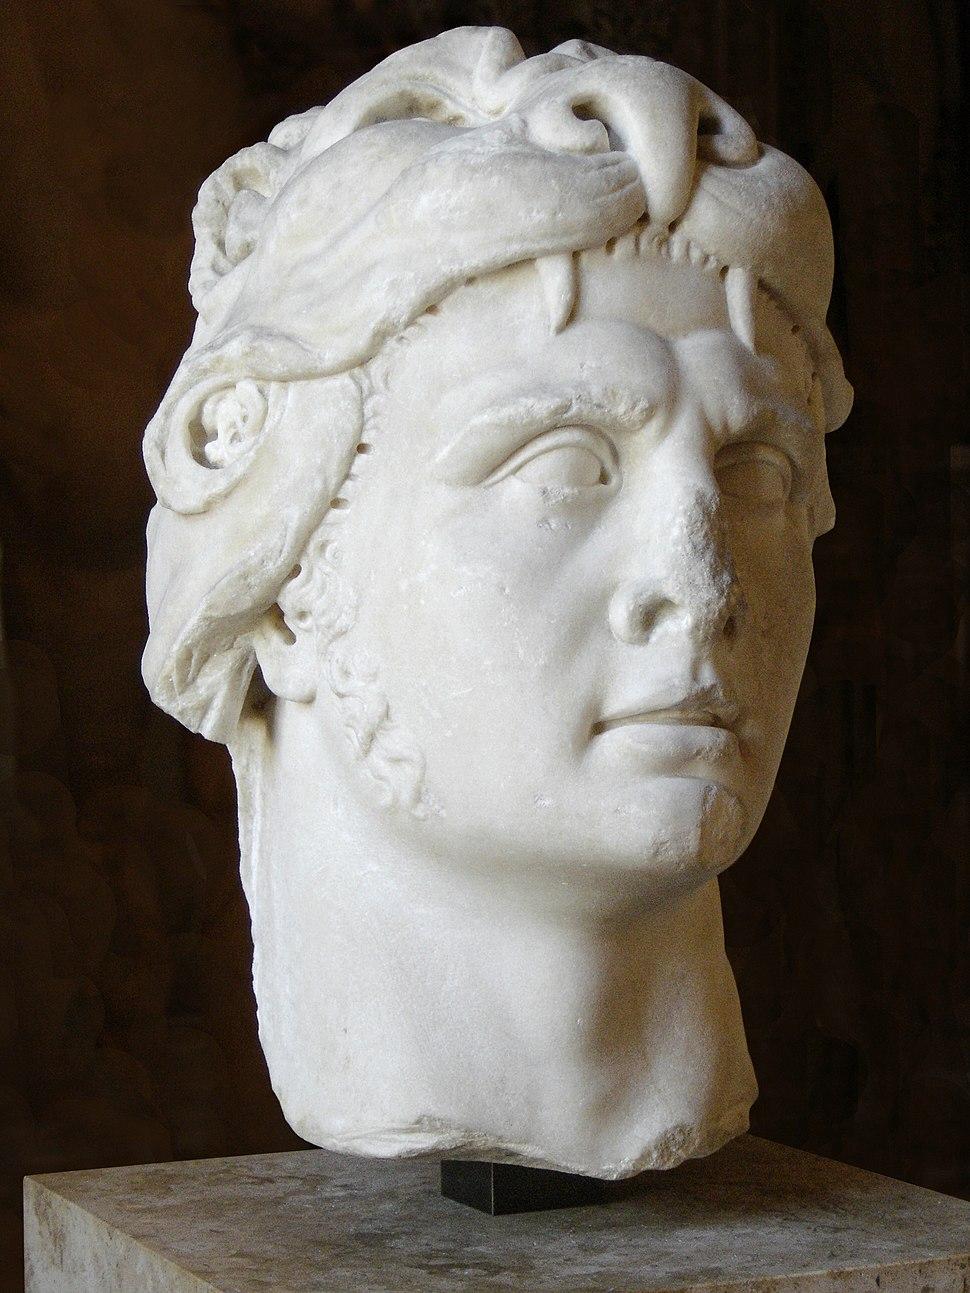 Mithridates VI Louvre